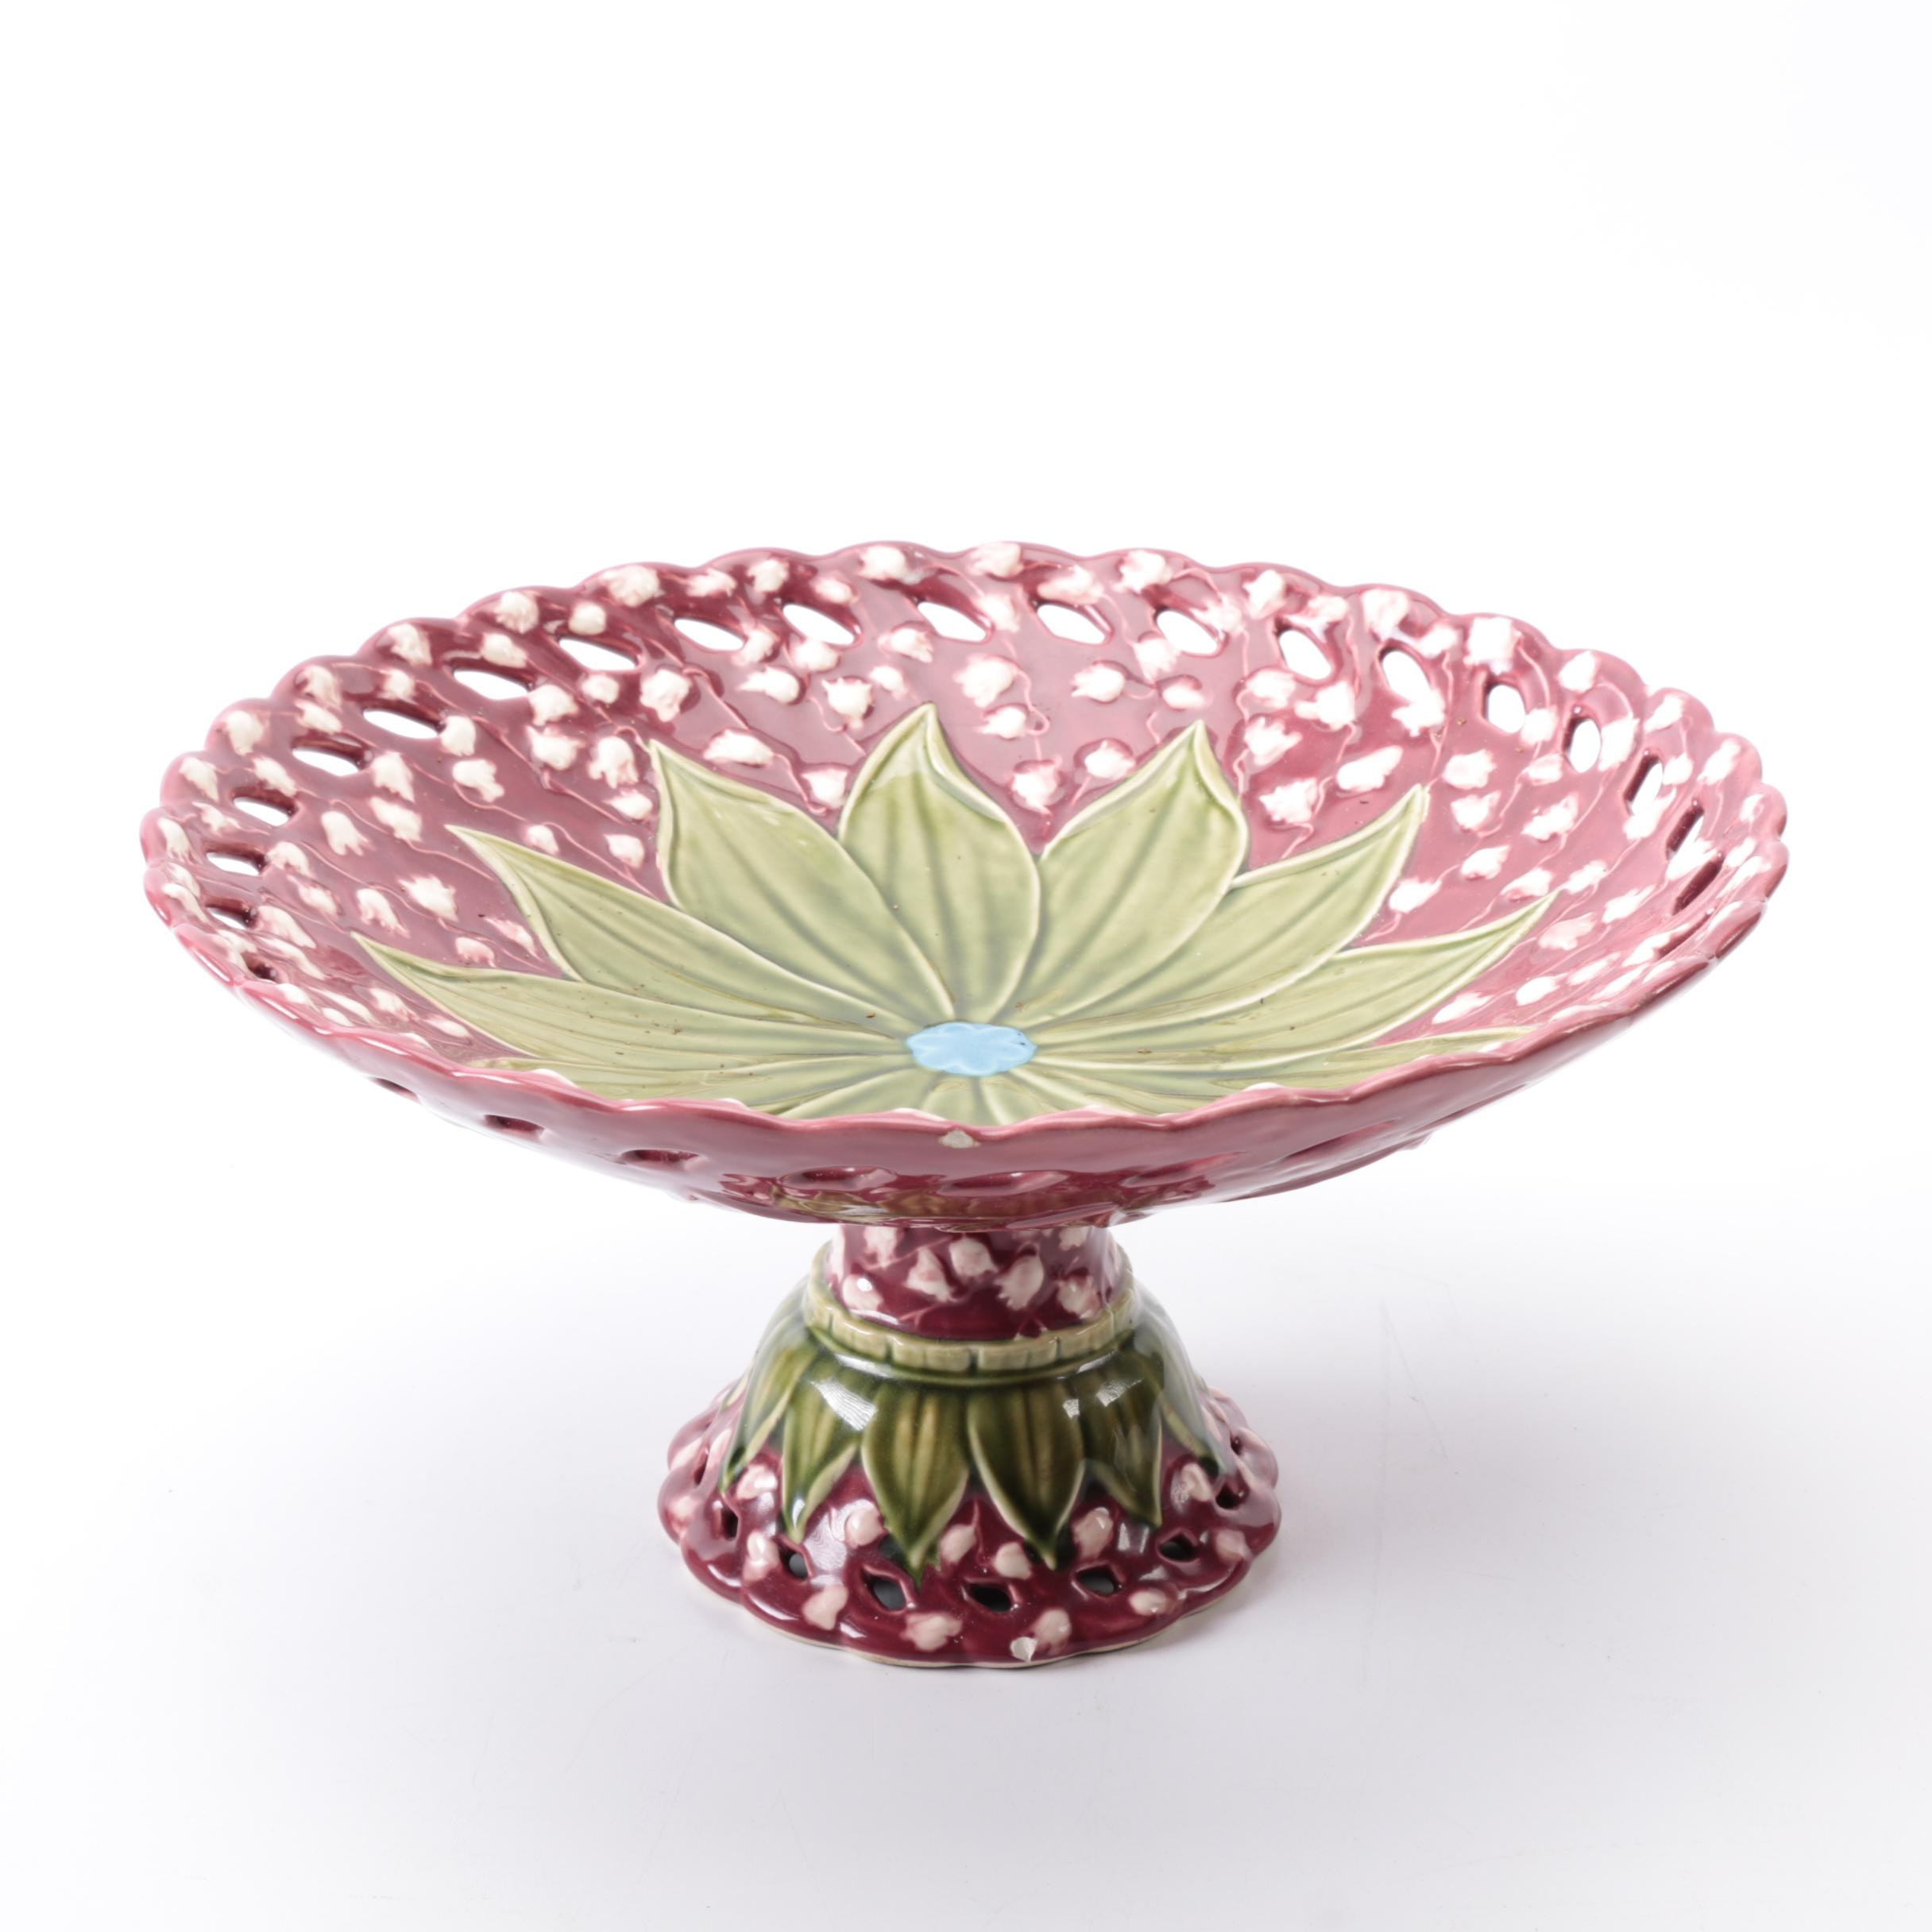 Bordallo Pinheiro Ceramic Compote